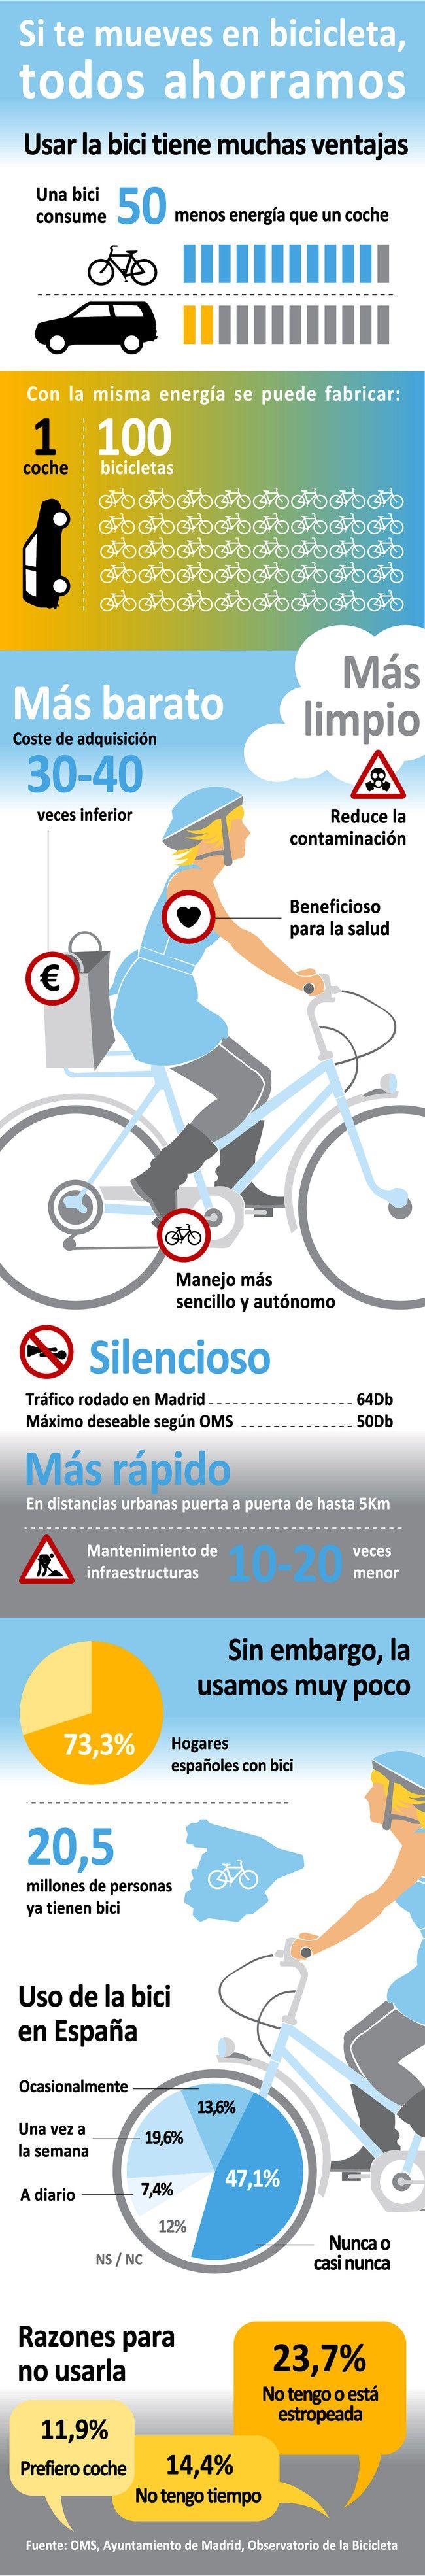 Si te mueves en bici, todos ahorramos #infografia #infographic #medioambiente @Alfredo Vela @Xavi Gassó